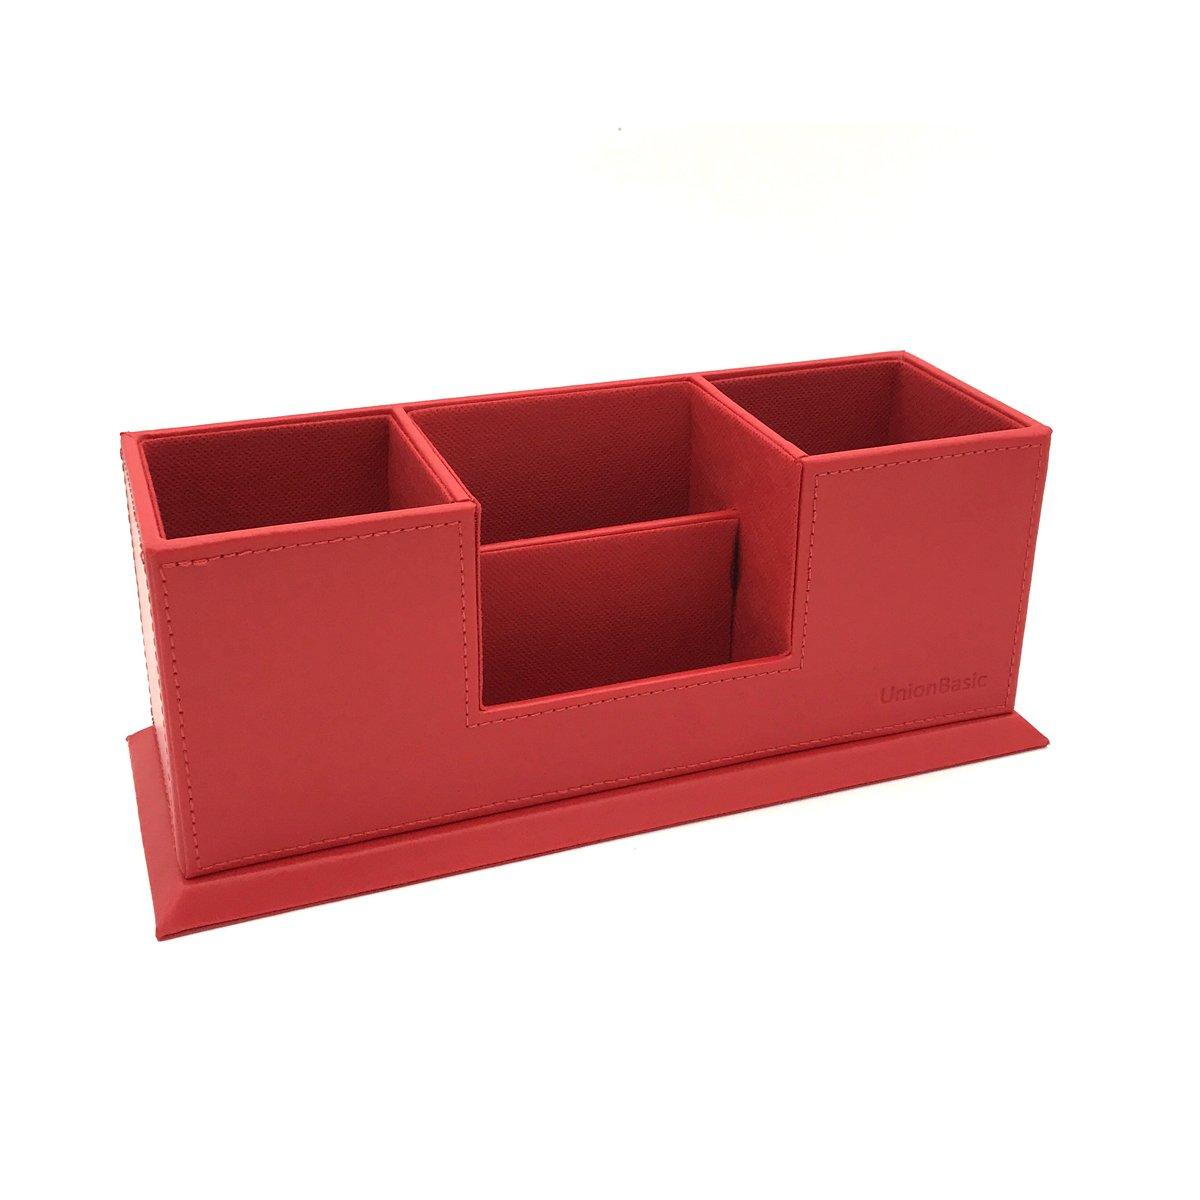 UnionBasic 4 Compartment Desk Organizer - Dual Pen Holder - Card/Pen/Pencil/Mobile Phone Office Supplies Holder (Red)